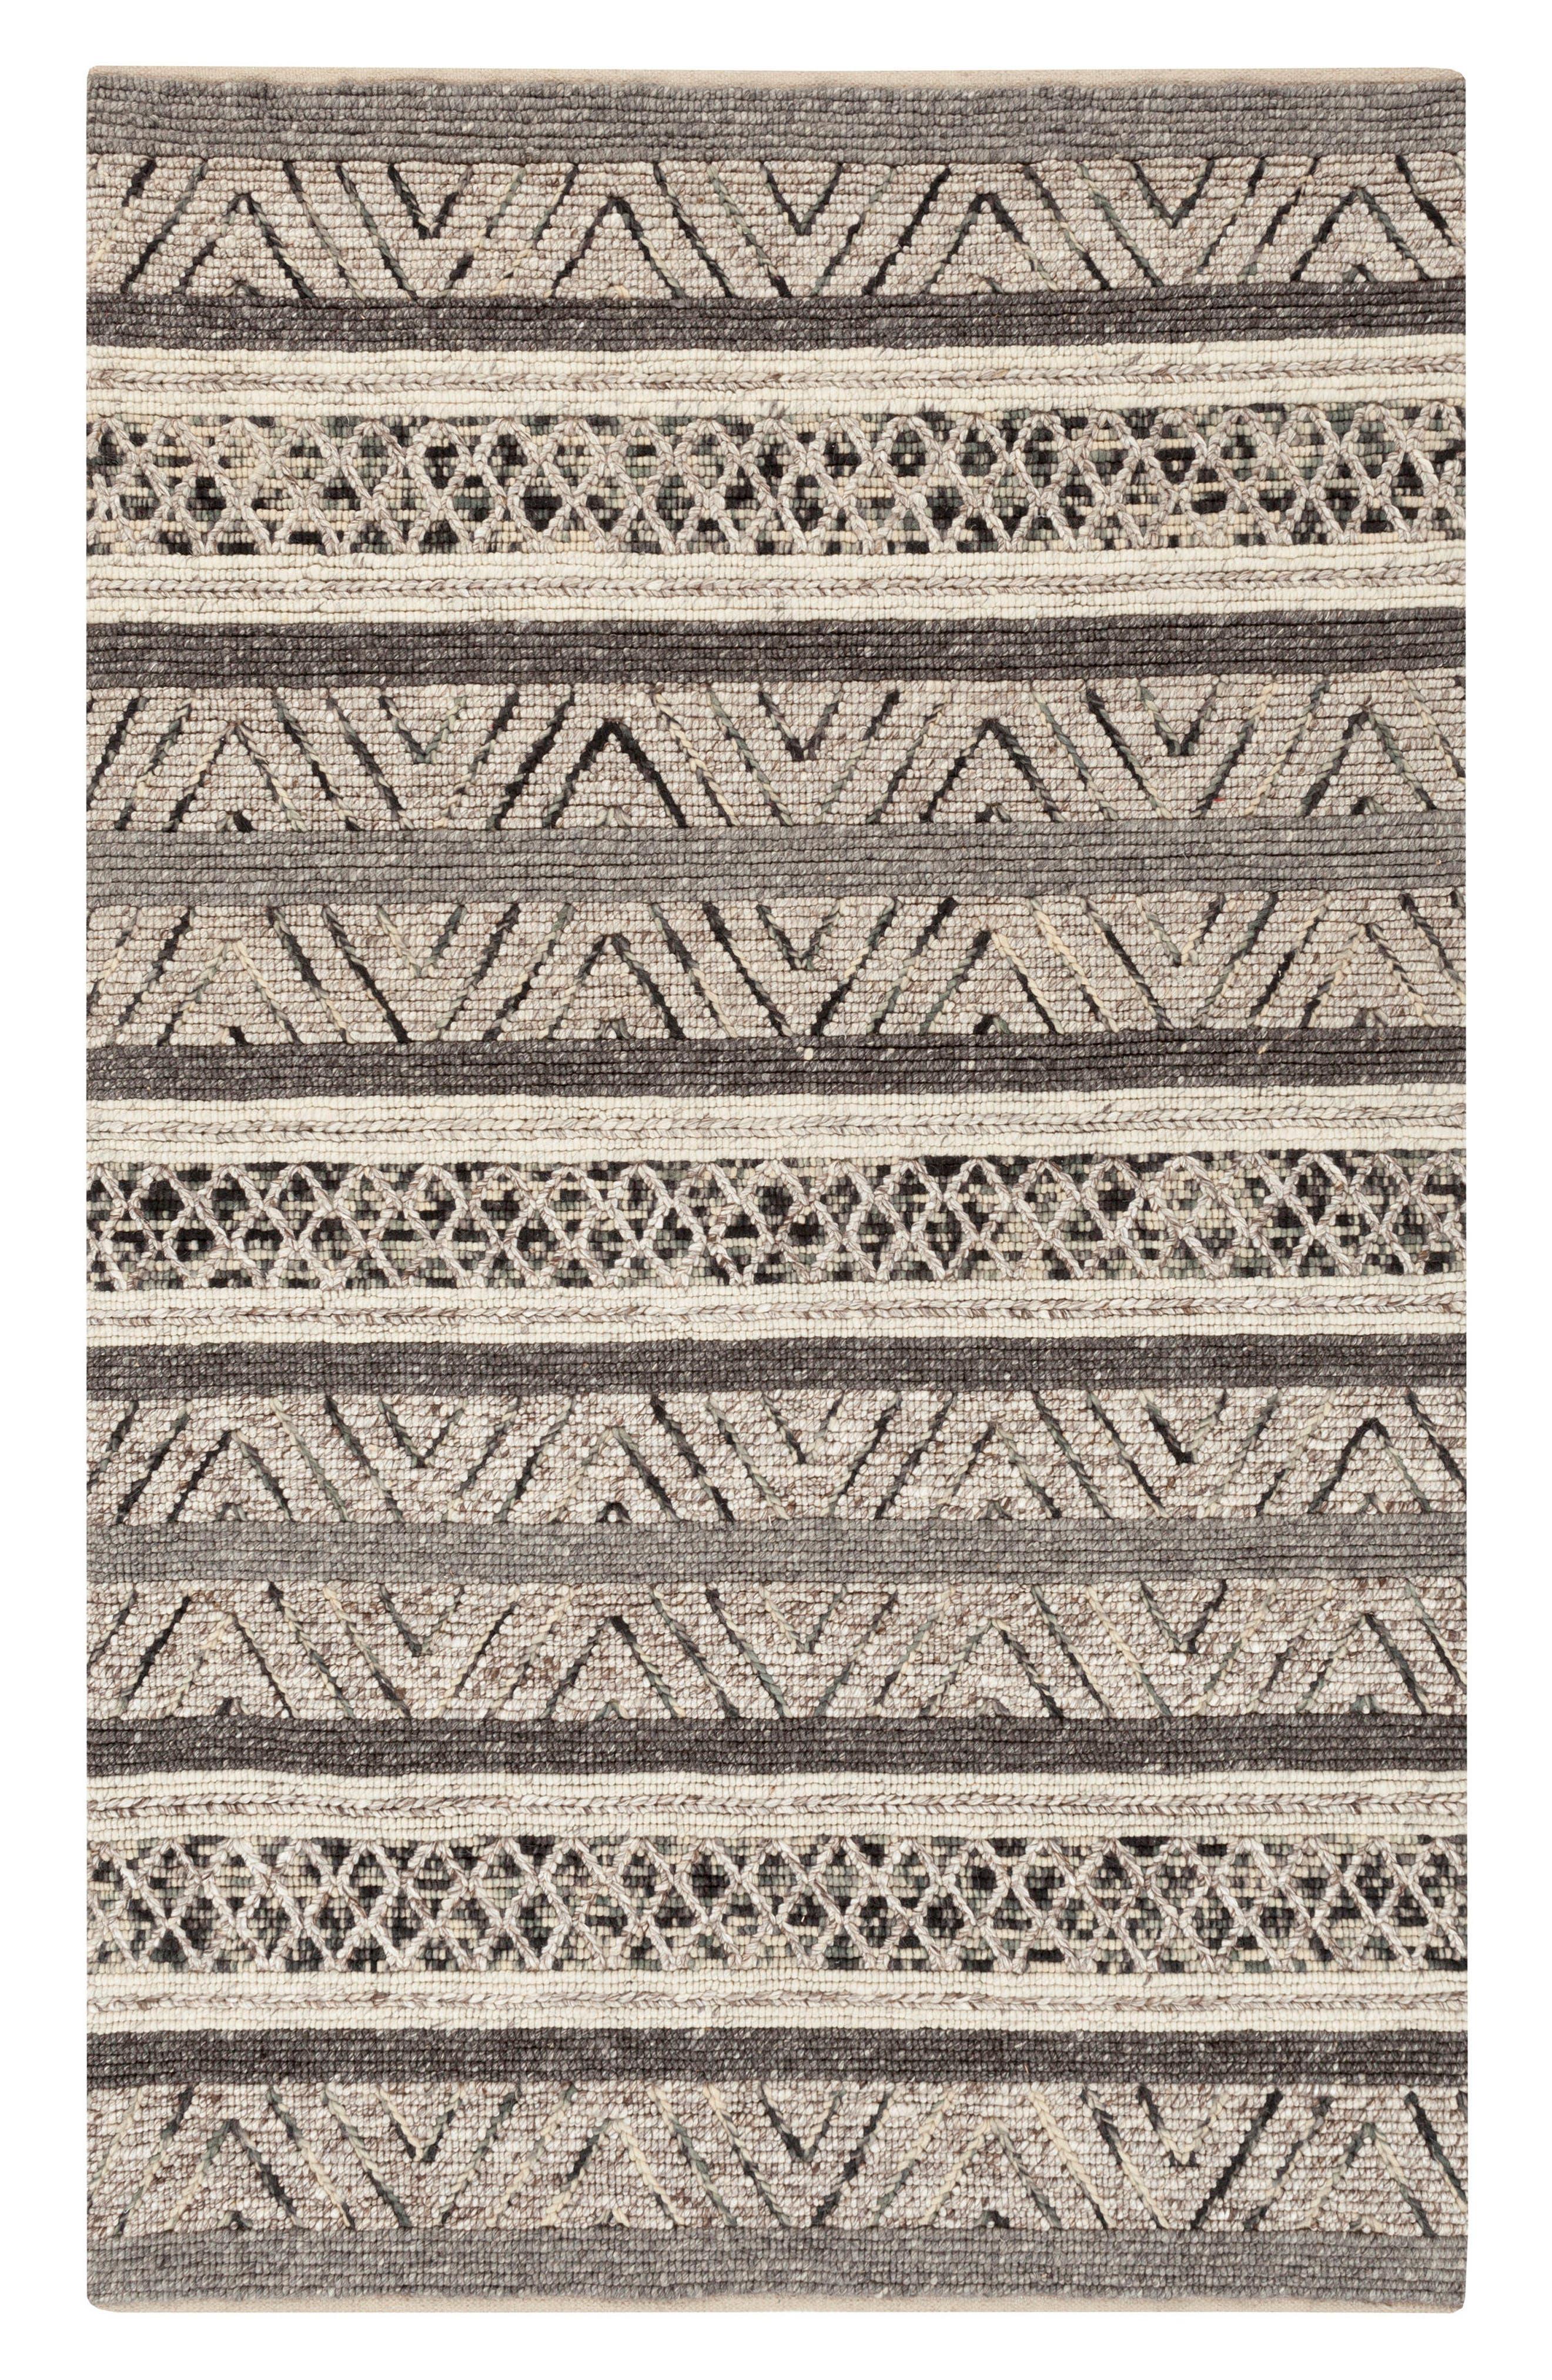 Alternate Image 1 Selected - Surya Home Nico Shag Wool Rug